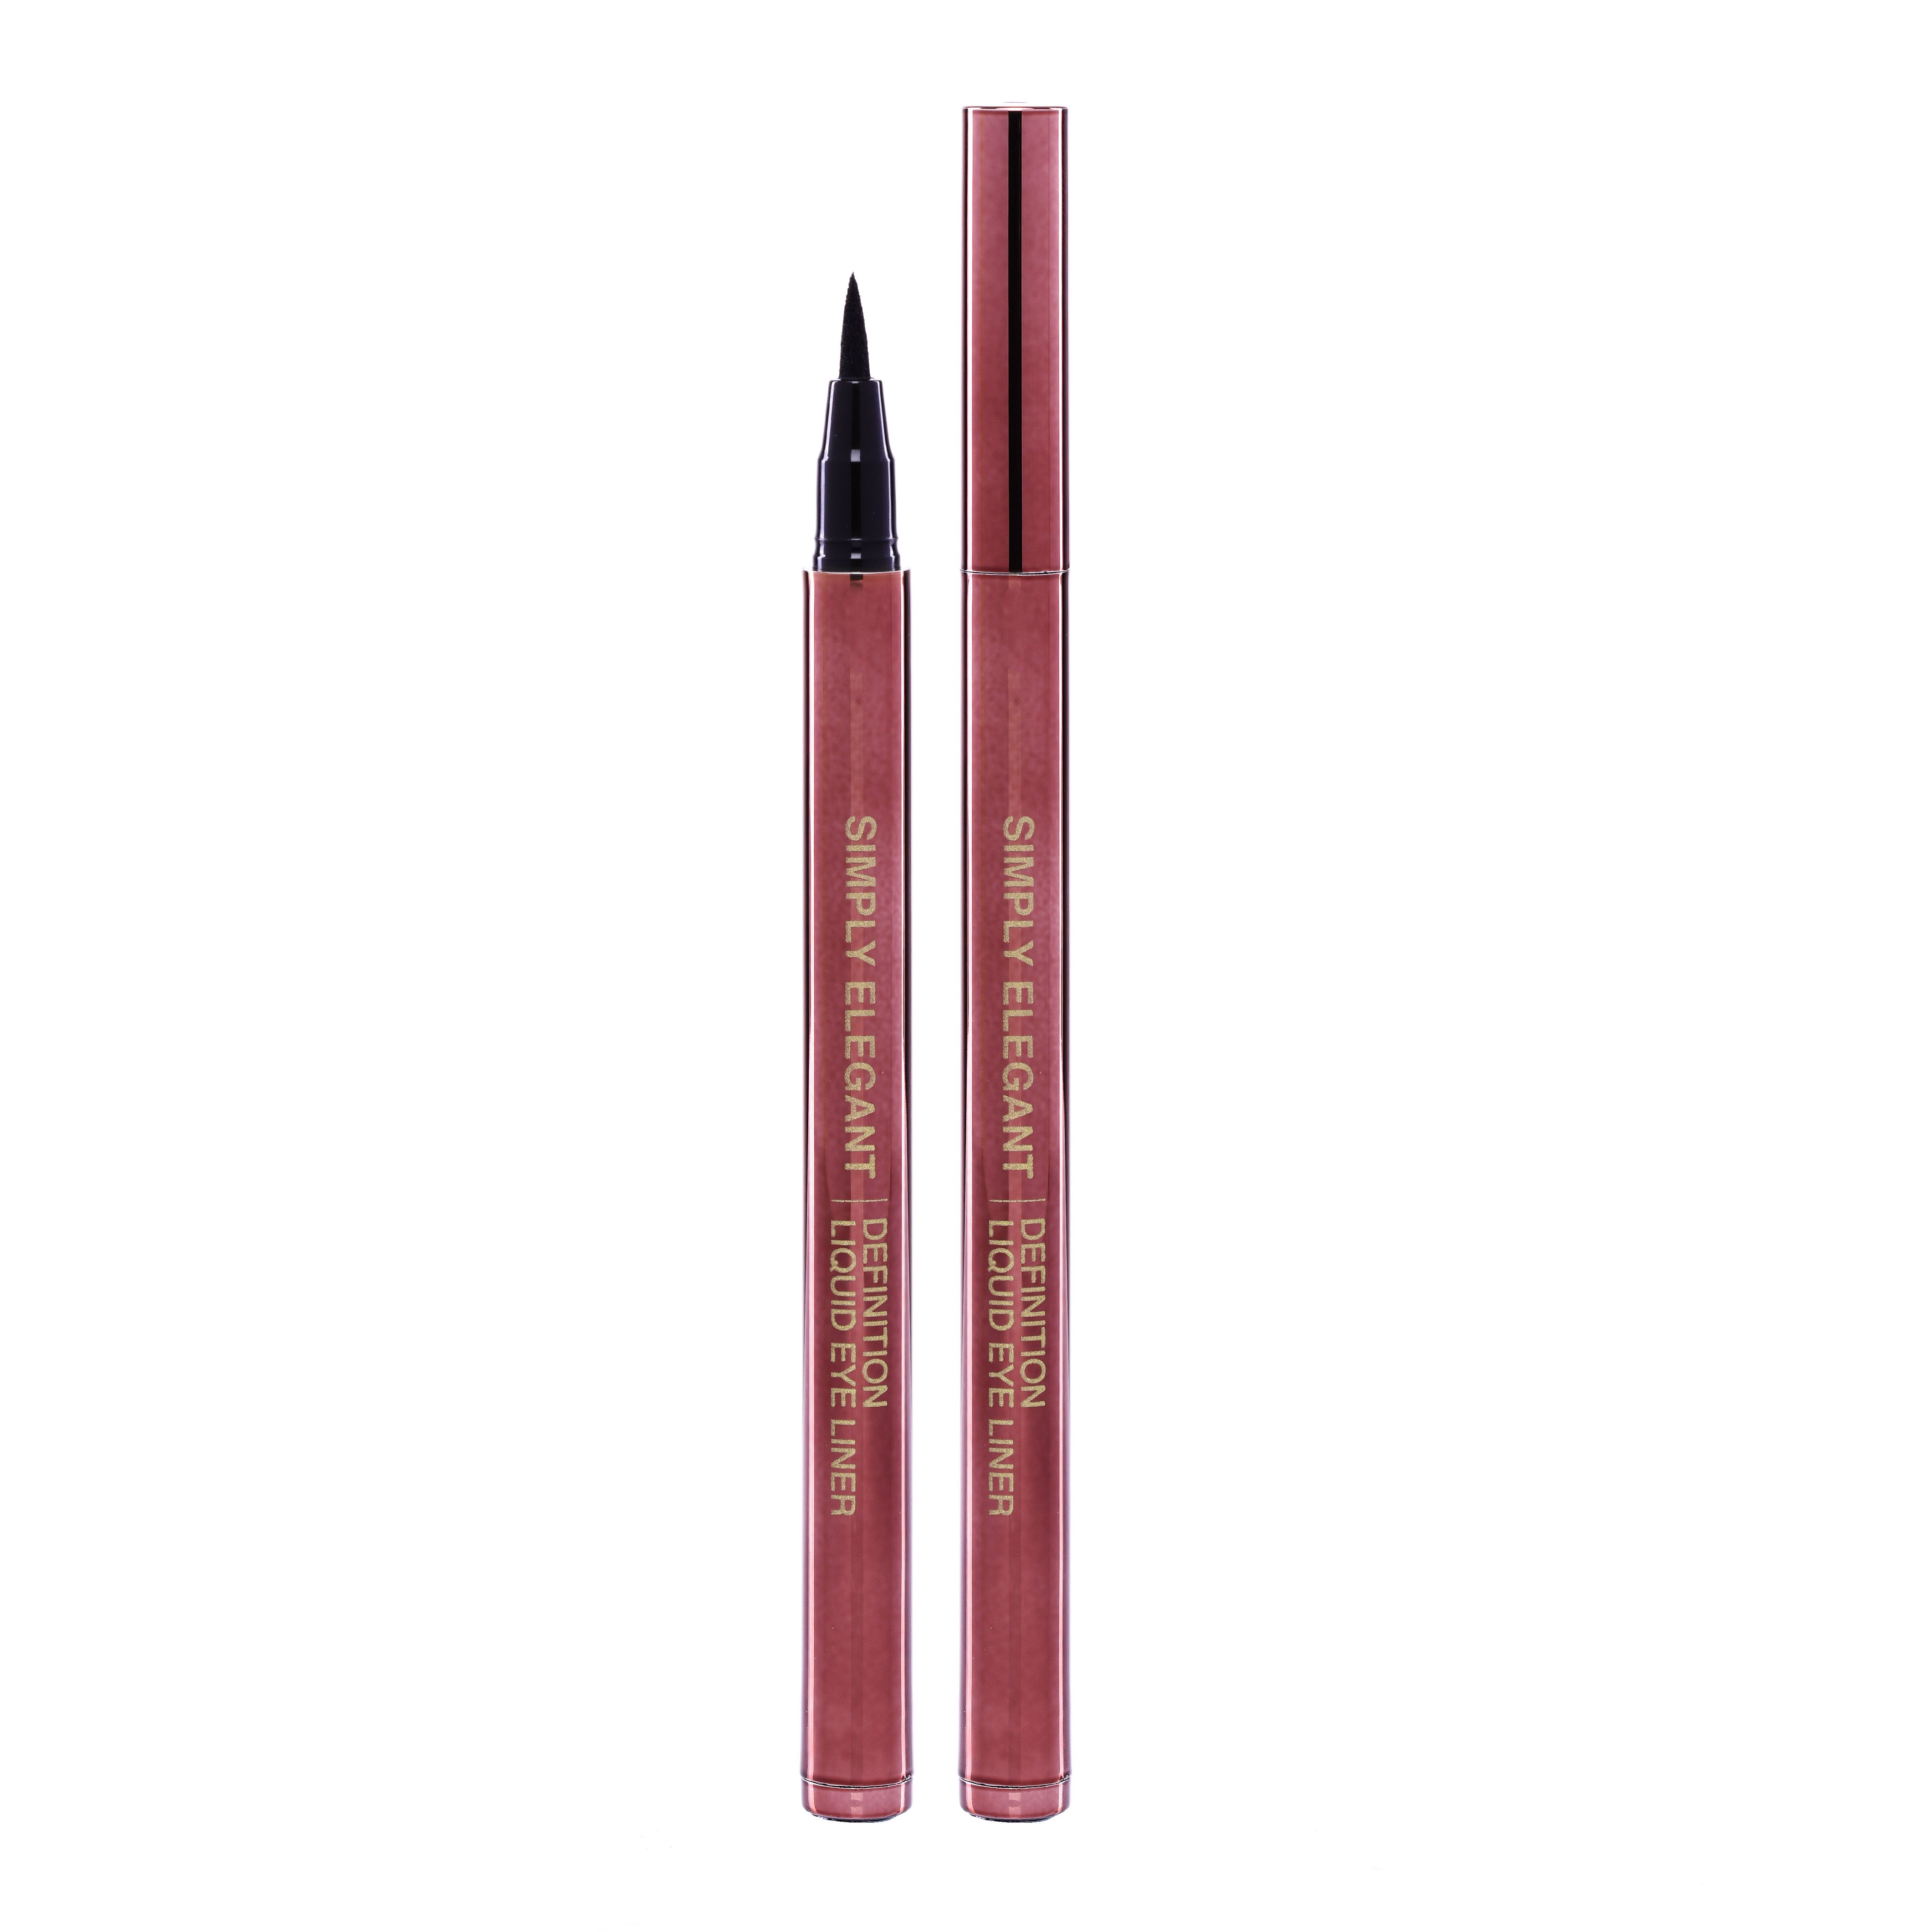 Simplysiti Simply Elegant Definition Liquid Eye Liner Black (DL 01)